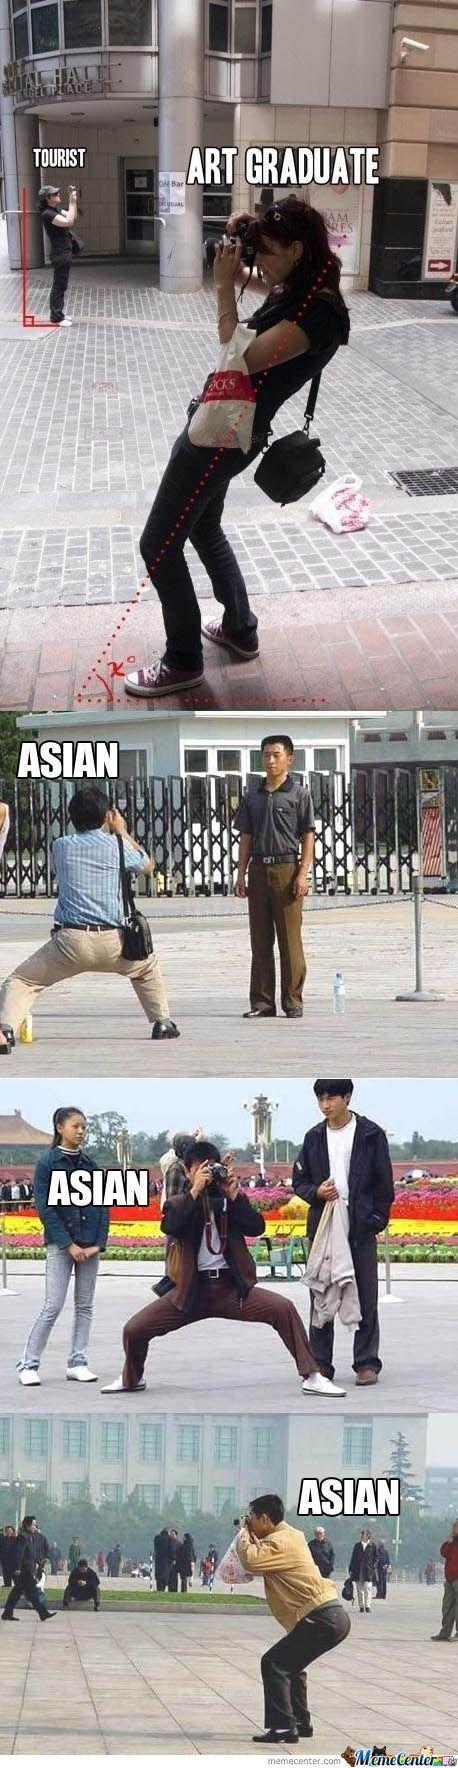 af5c99e02e5157901f980fb0c478cc69 15 best memes (funny) images on pinterest funny things, ha ha